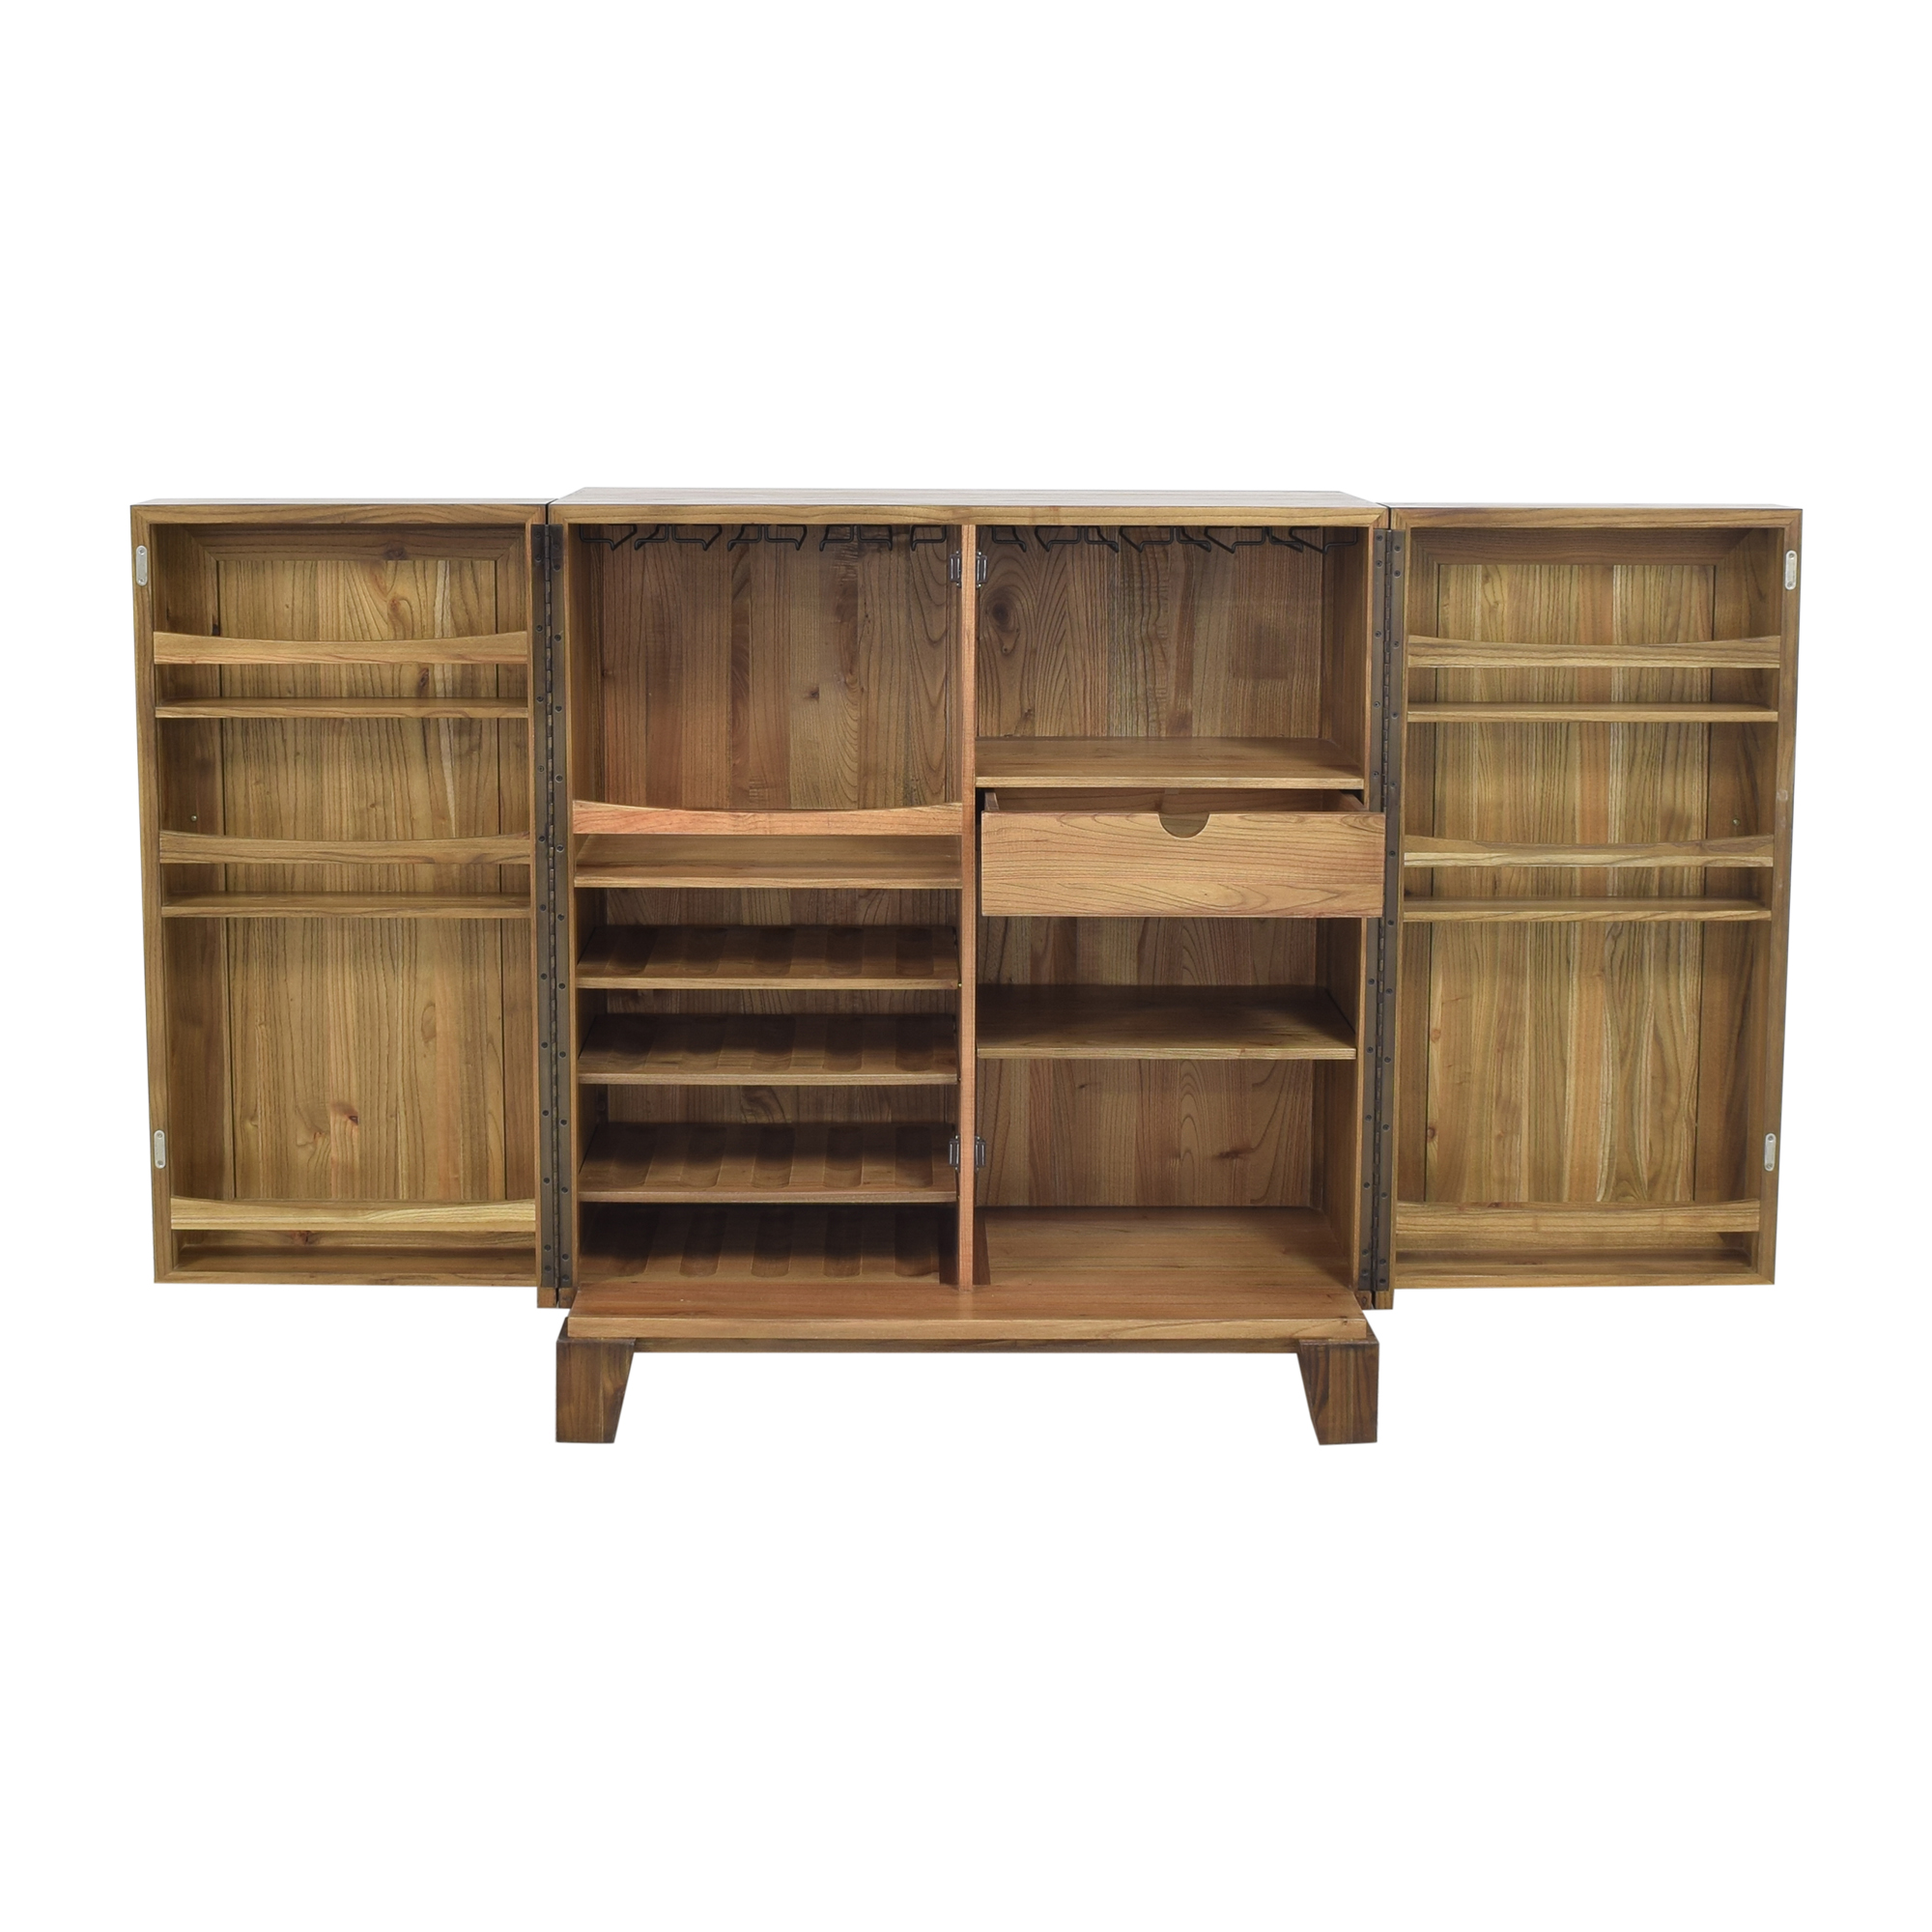 Crate & Barrel Crate & Barrel Marin Bar Cabinet brown